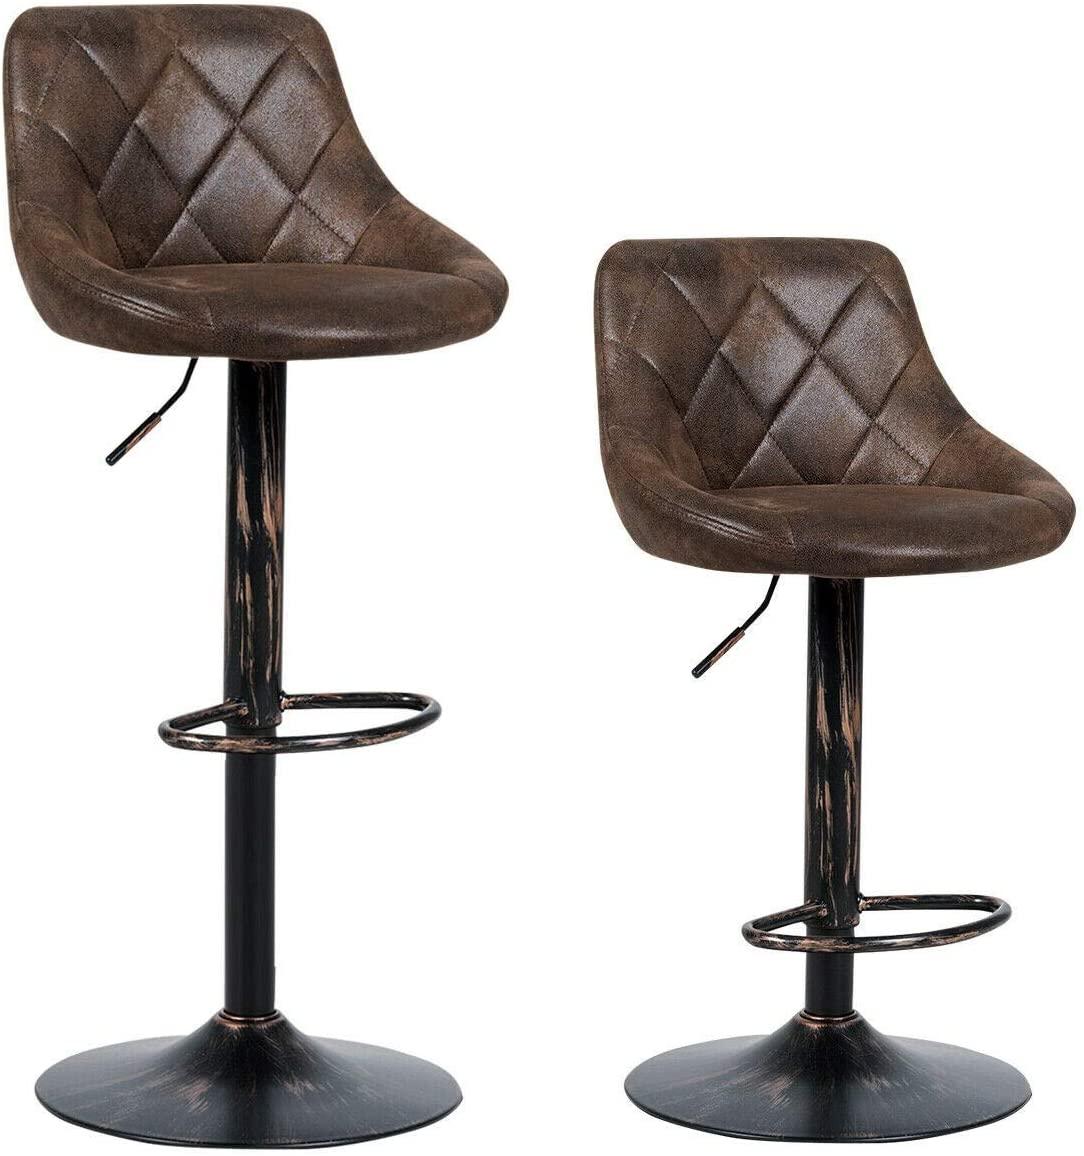 7DIPT Set of 2 Adjustable Bar Stools with Backrest and Footrest